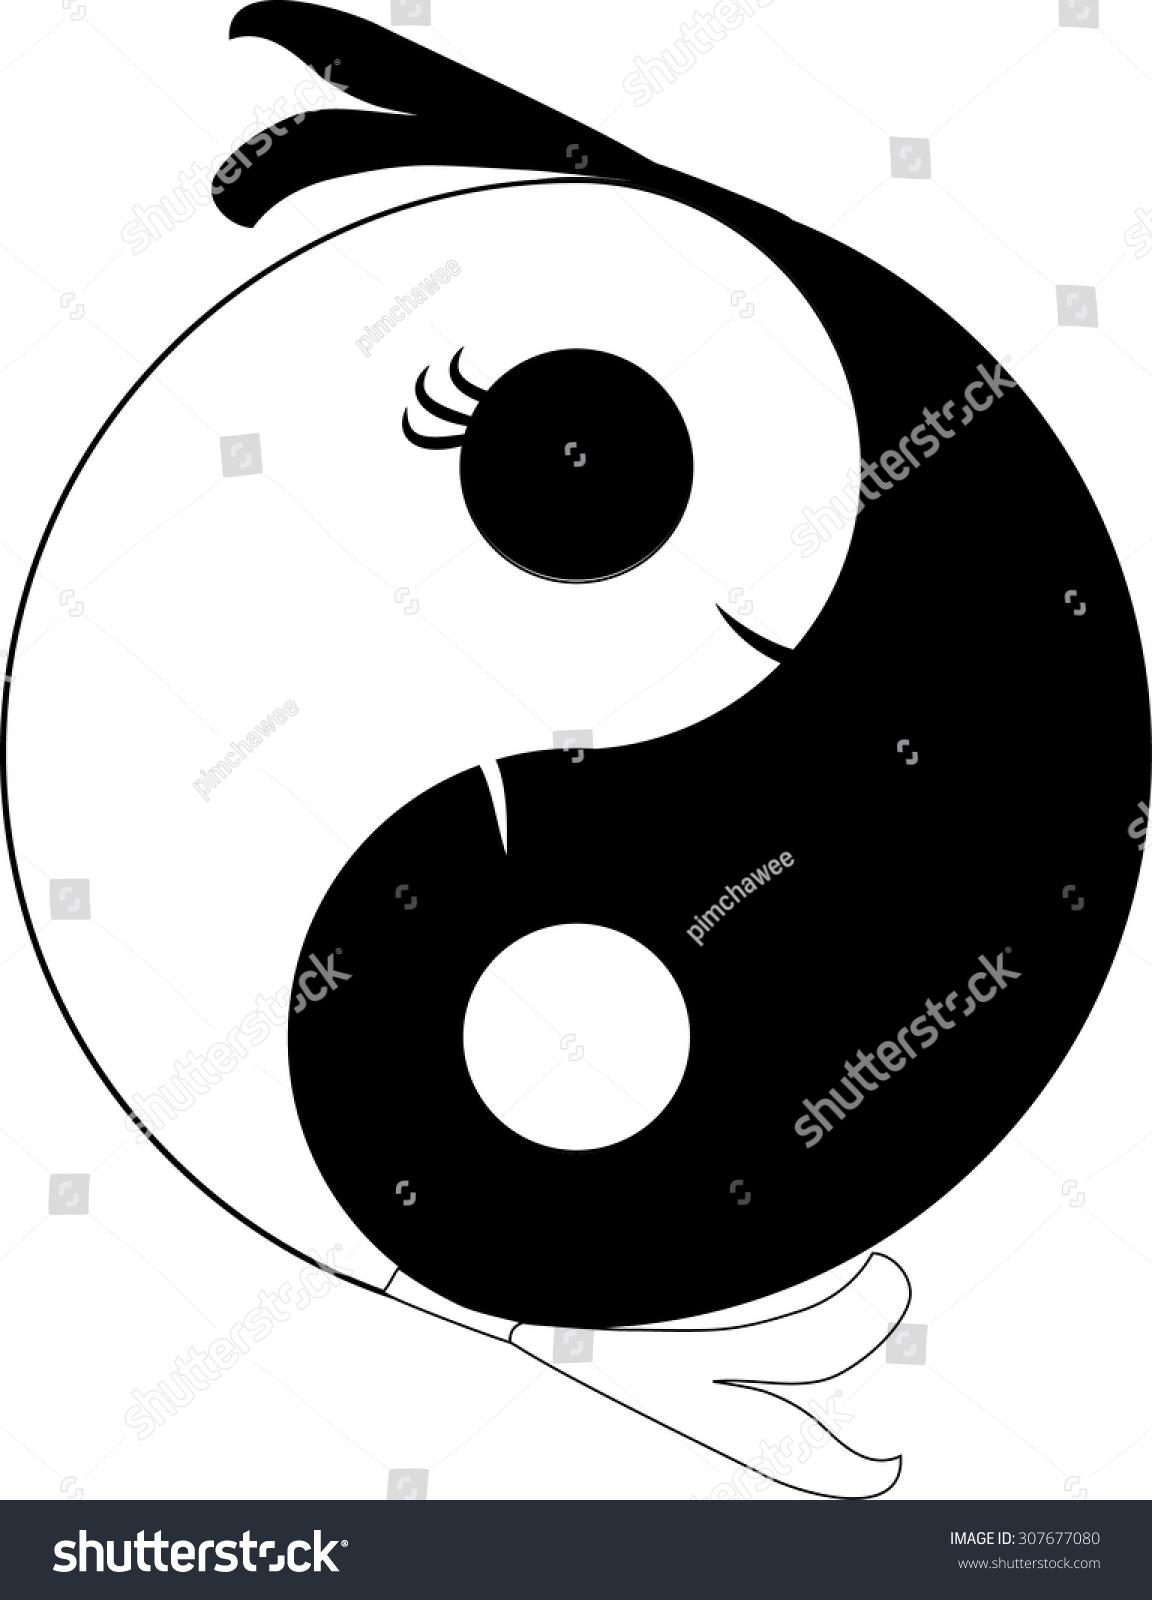 Yin yang symbol harmony balance chinese stock vector 307677080 yin yang symbol of harmony and balance chinese pair of fish in yin yang circle buycottarizona Gallery